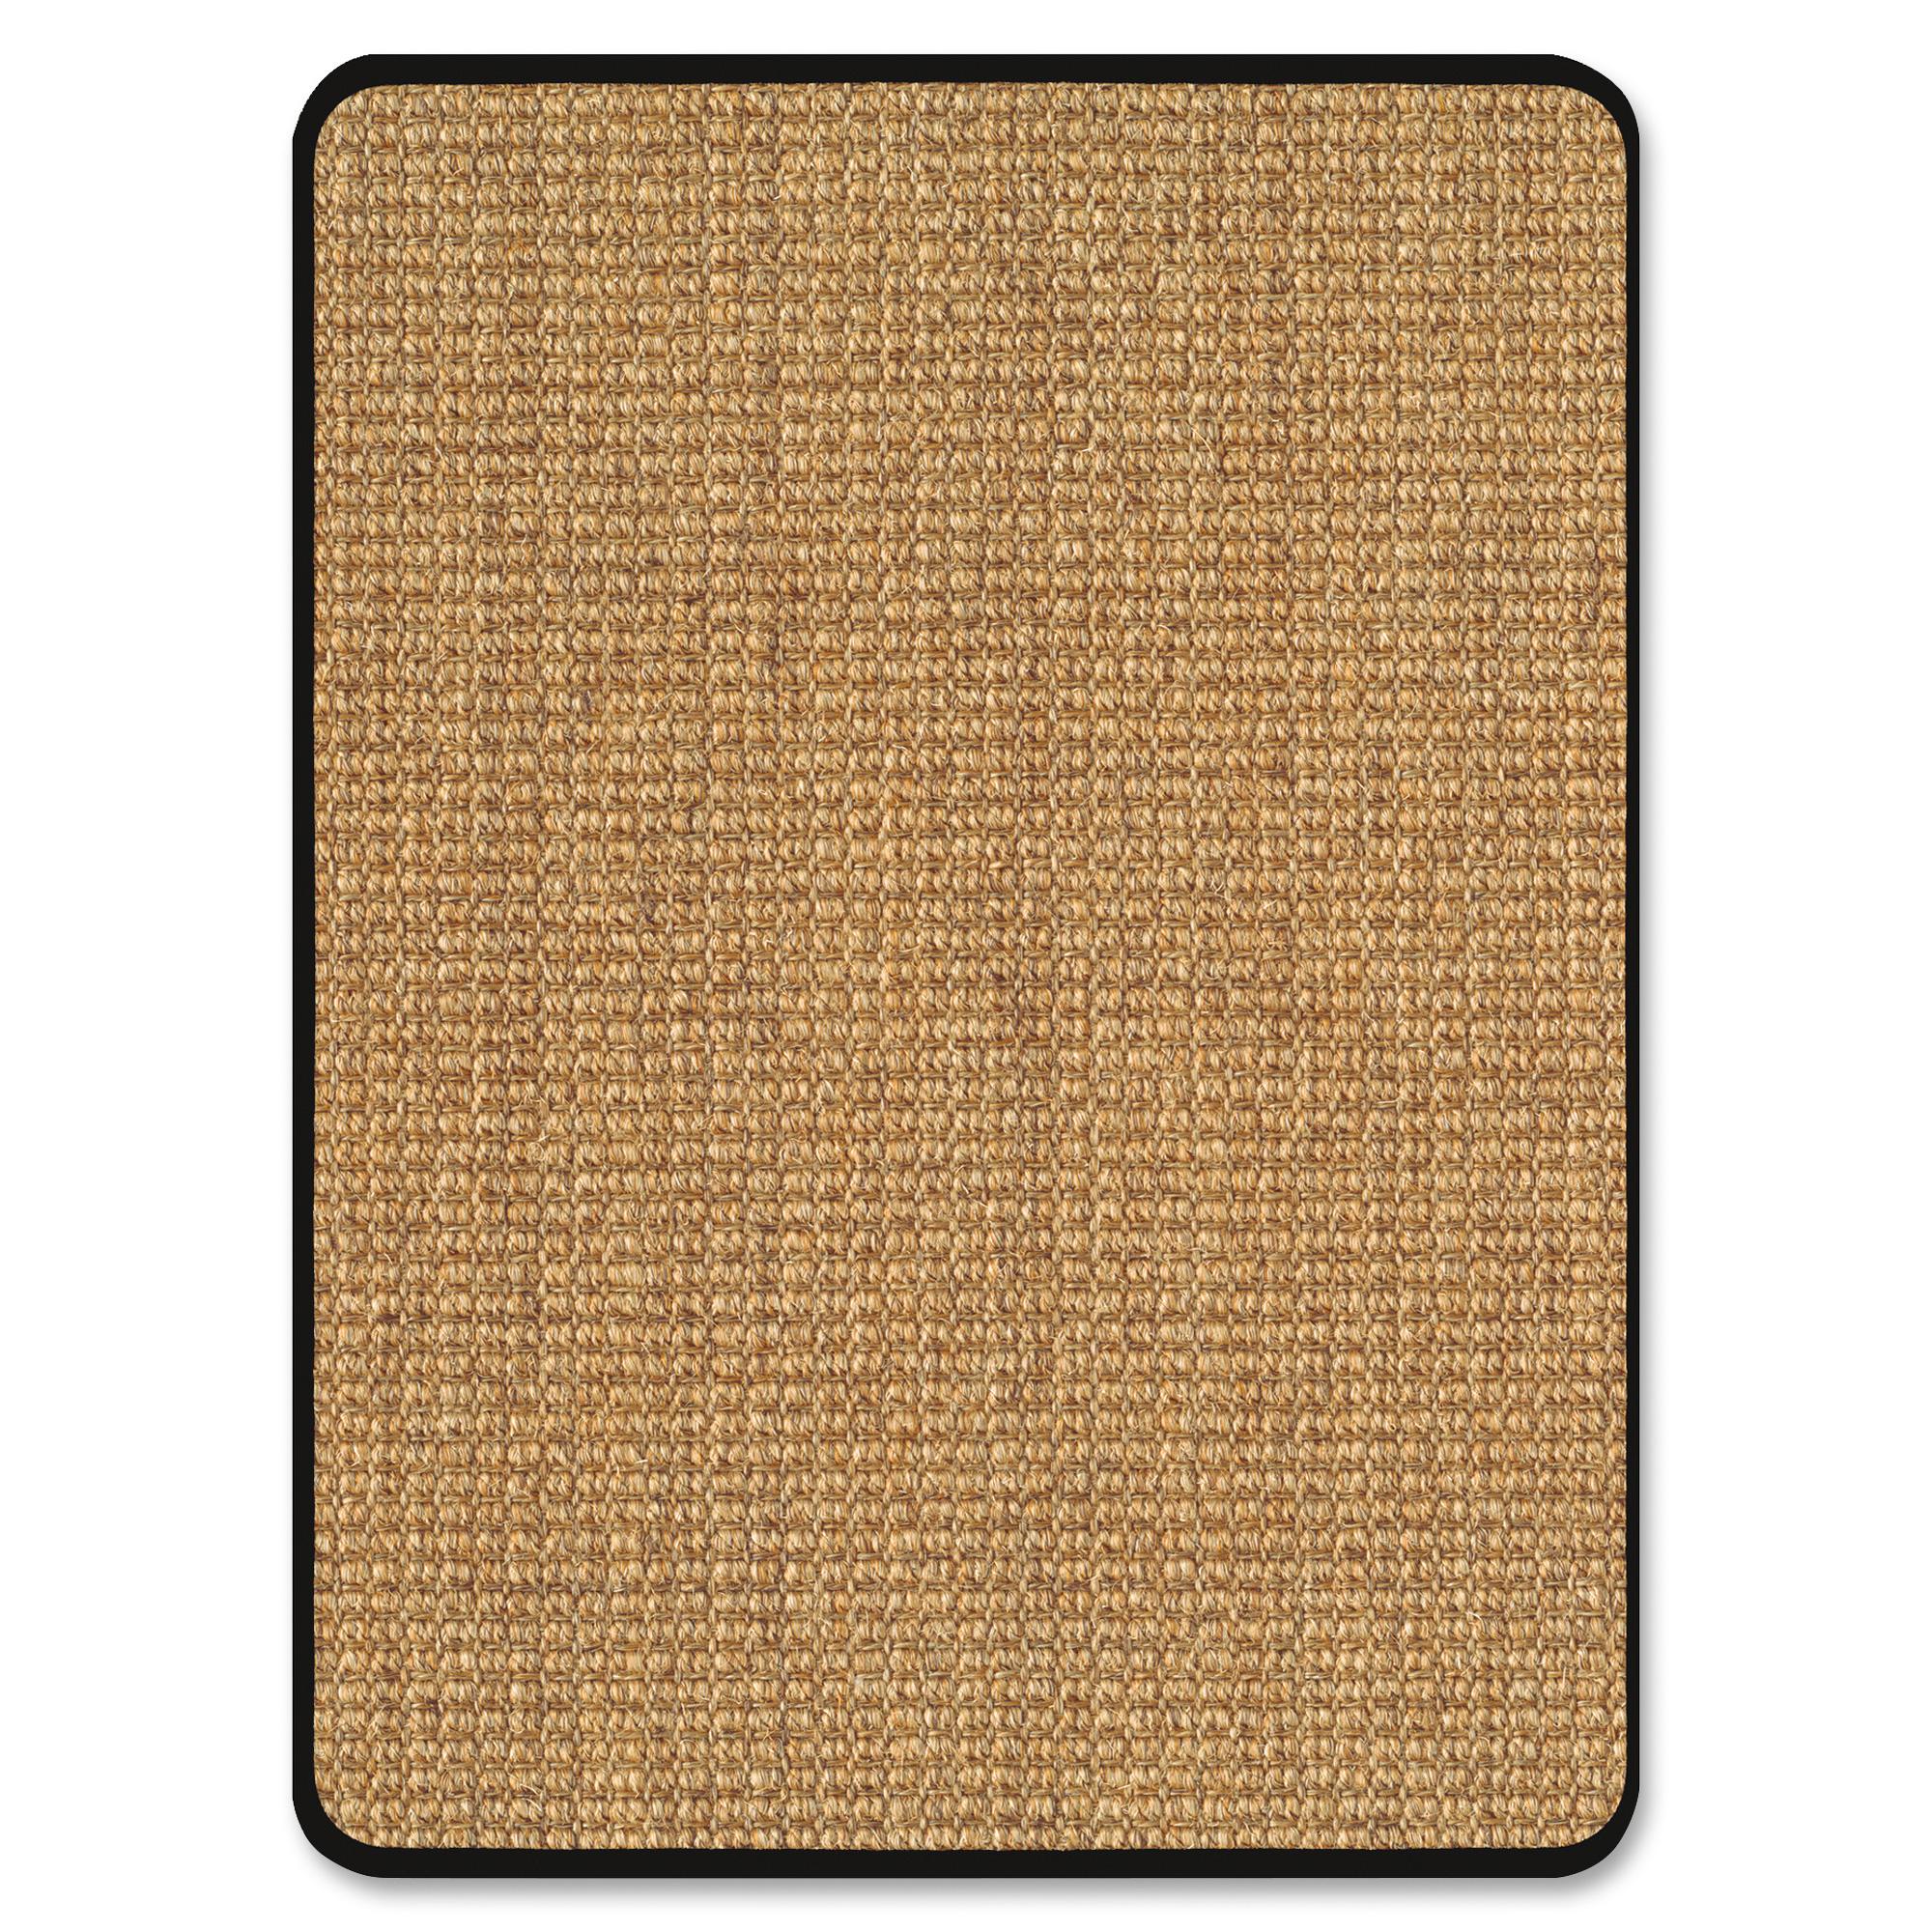 "Deflect-o Harbour Pointe Color Band Sisal Decorative Chairmat for Hard Floors - Hard Floor, Wood Floor, Tile Floor, Vinyl Floor - 60"" Length x 46"" Width - Rectangle - Vinyl - Light Brown"